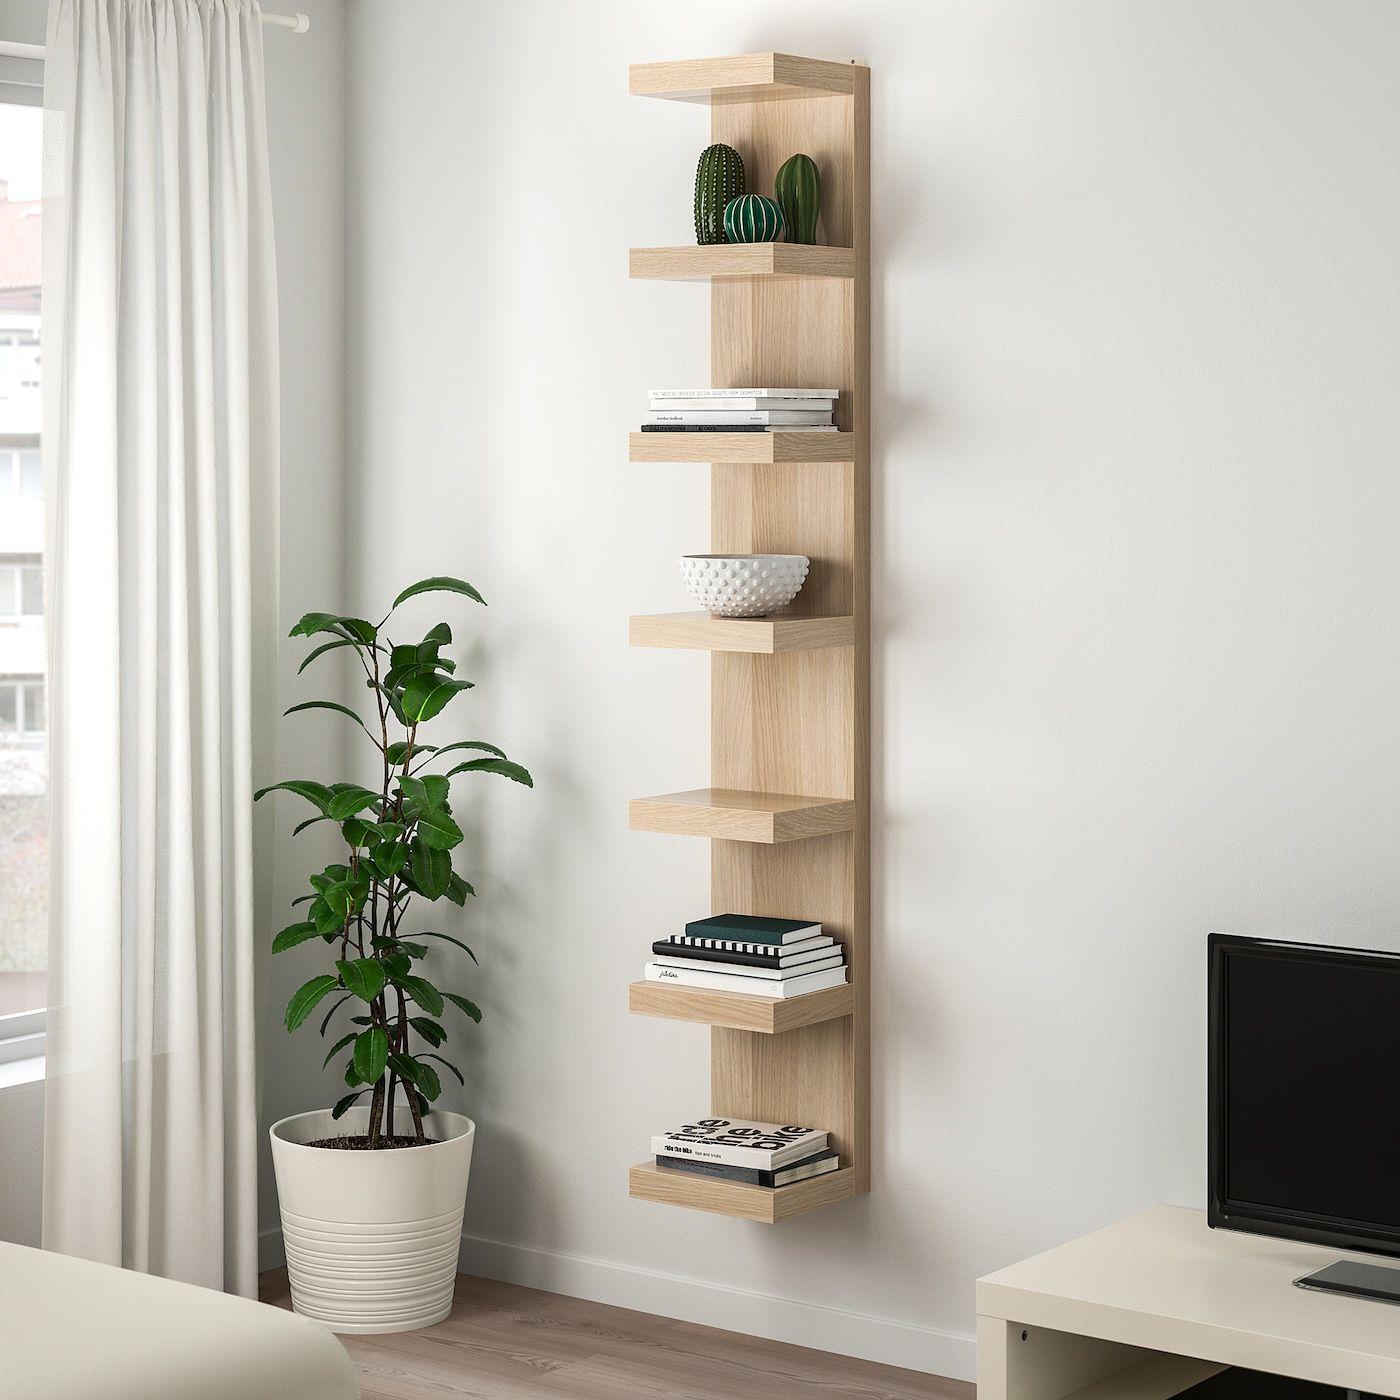 Lack Estante De Parede Ef Carvalho C Velatura Branca 30x190 Cm Ikea Ikea Lack Wall Shelf Wall Shelf Unit Ikea Lack Shelves